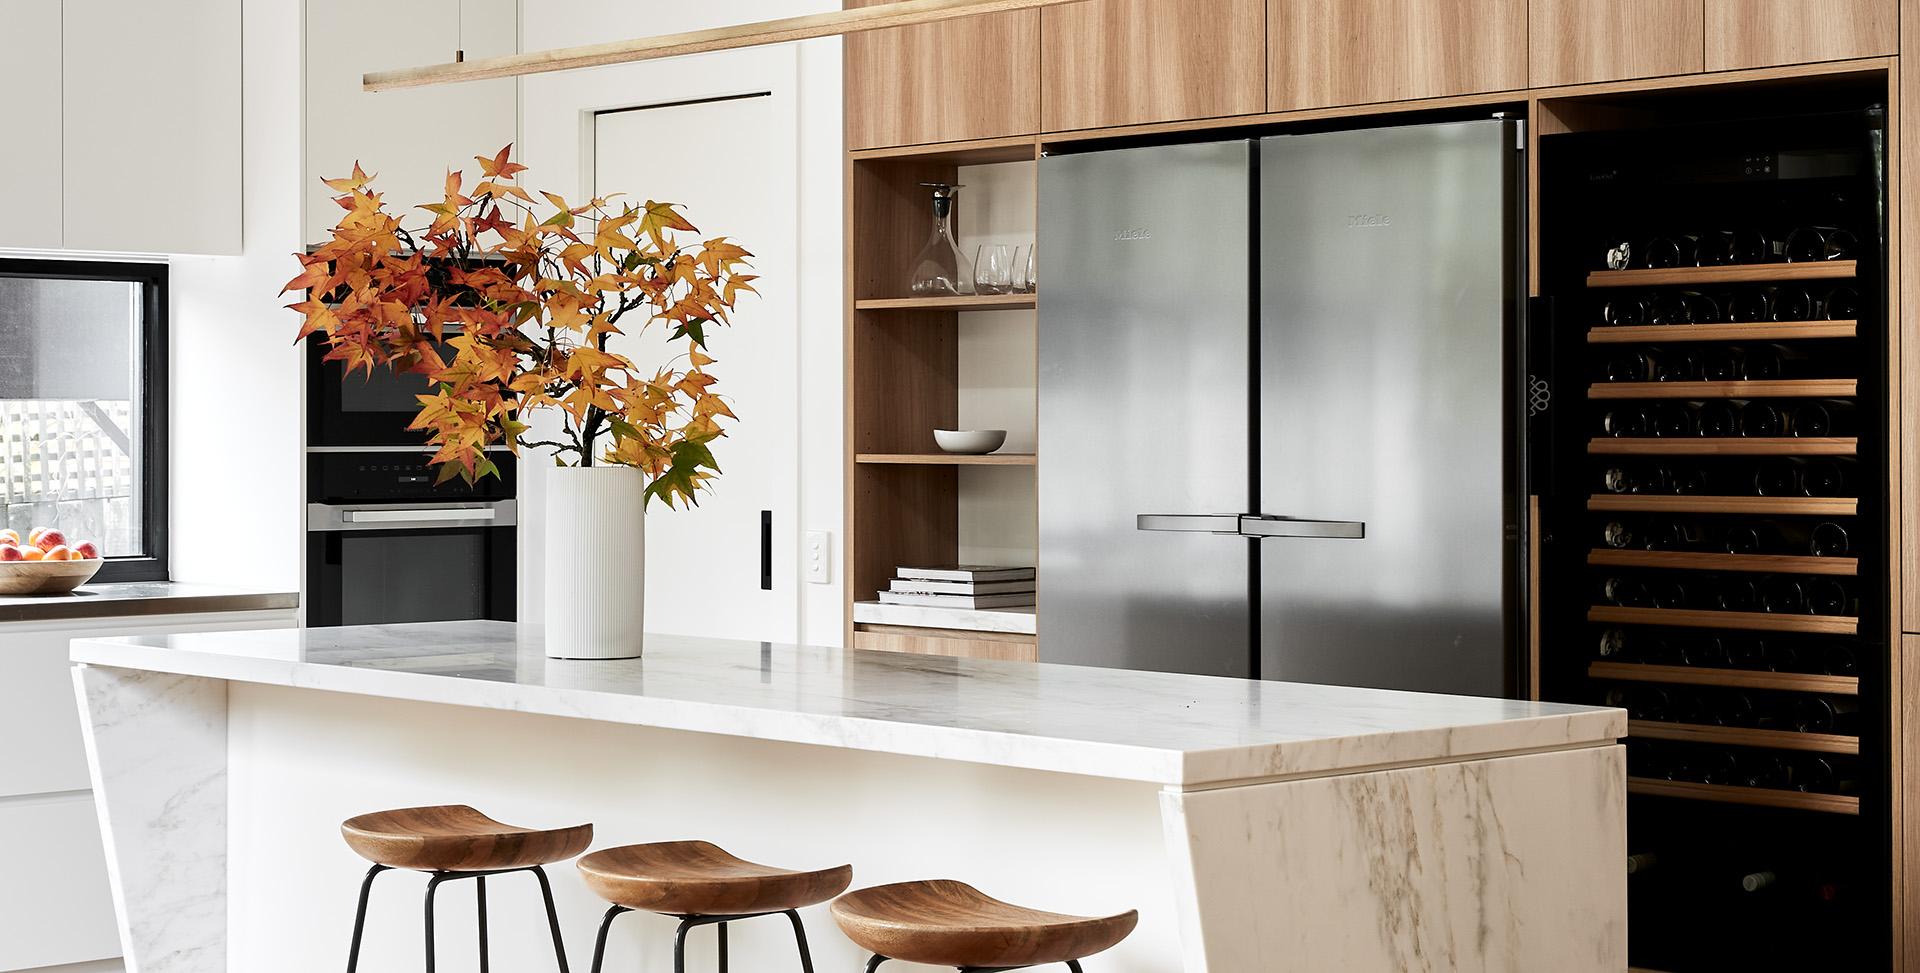 Home - image QuadrantDesign_Homepage-June0 on https://www.quadrantdesign.com.au